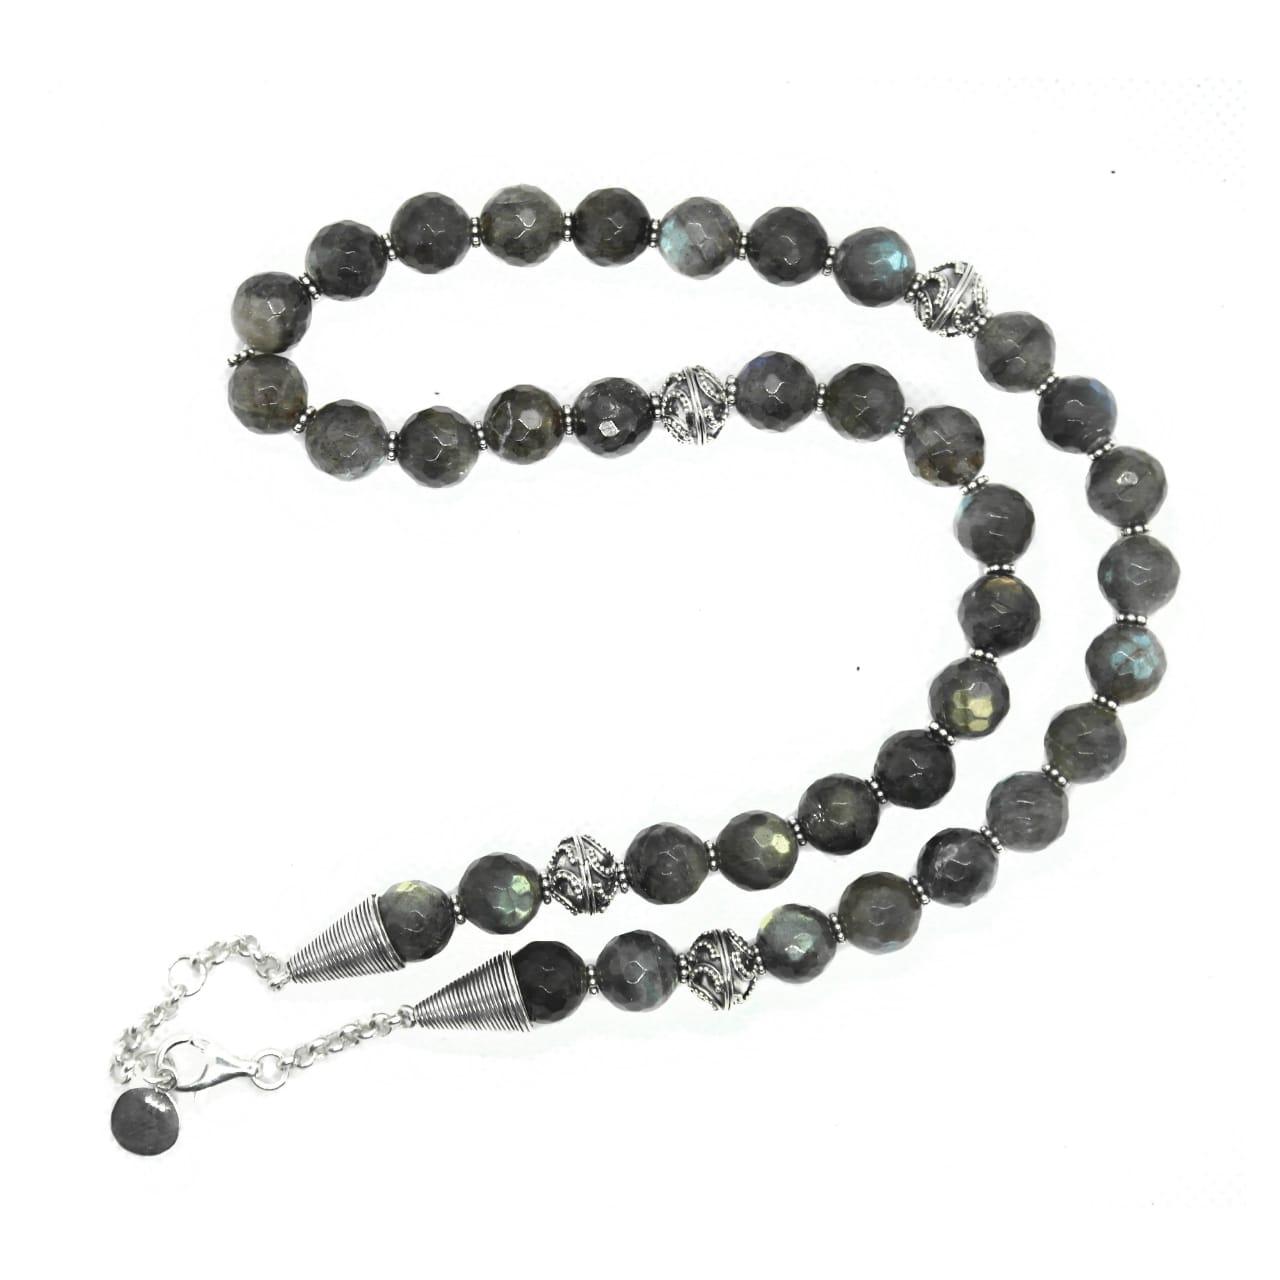 Faceted Labradorite necklace – (NB101)